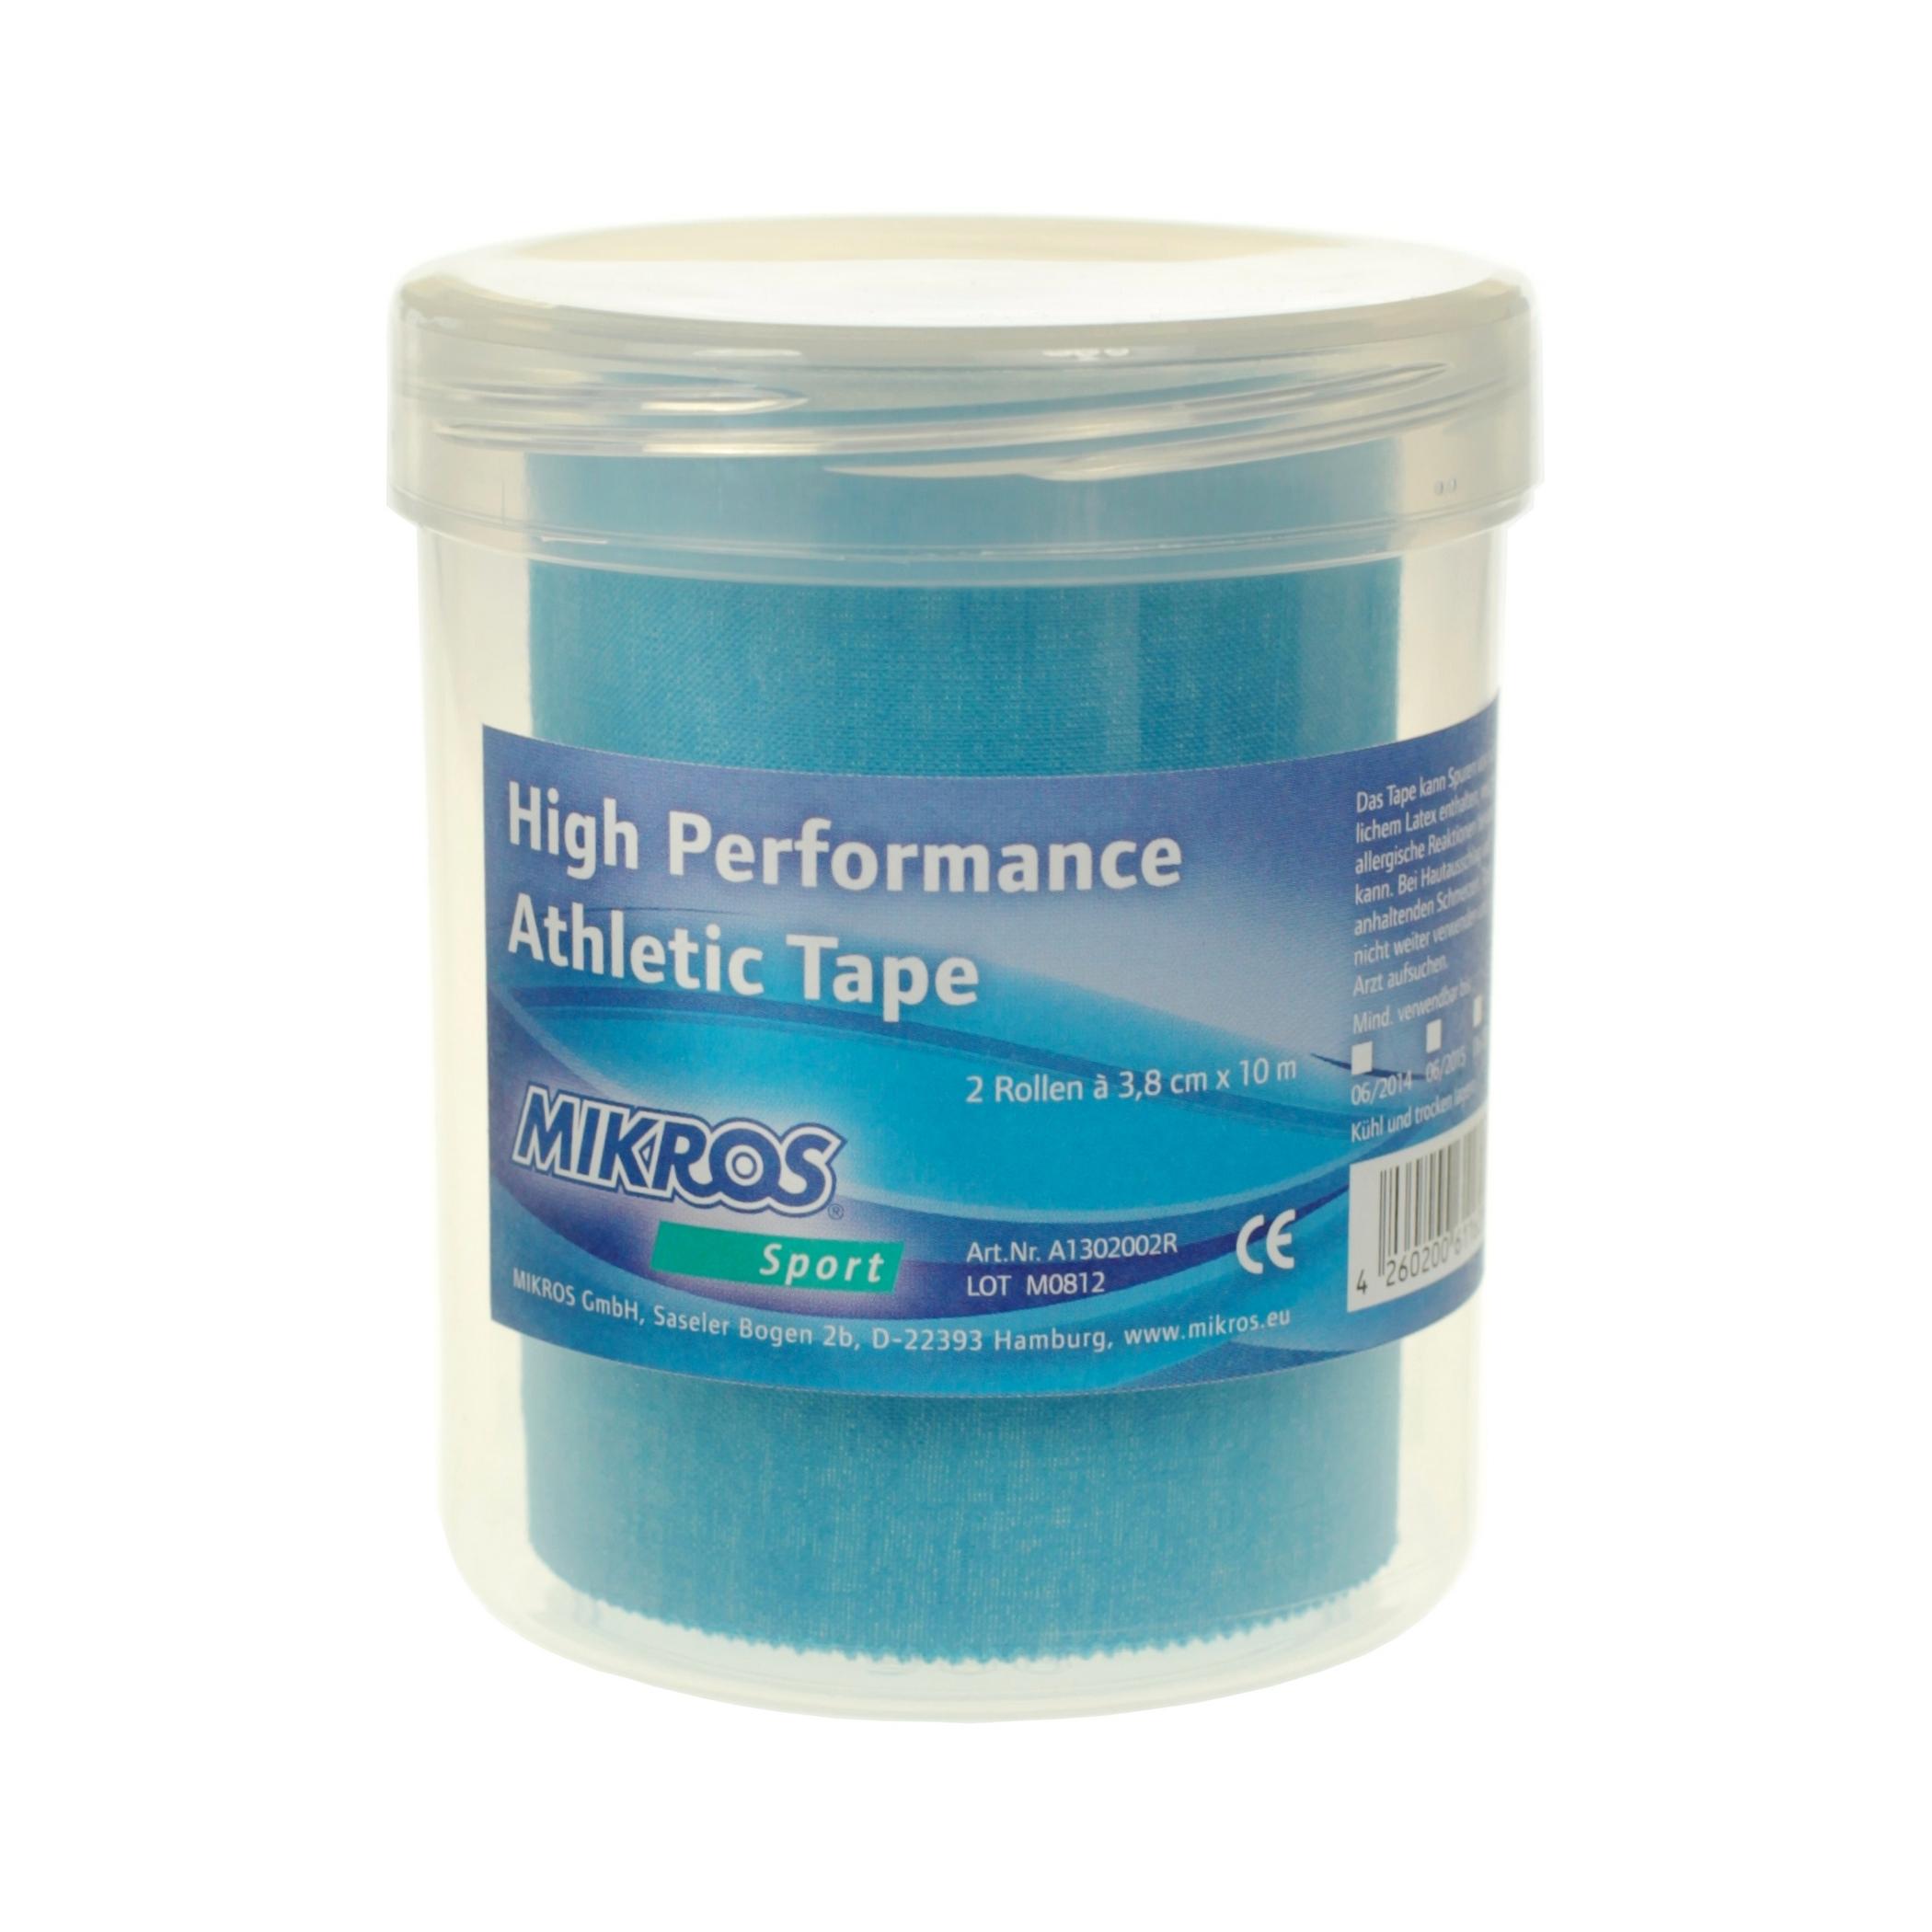 Mikros High Performance Tape - 2-Rollen-Box - Blau